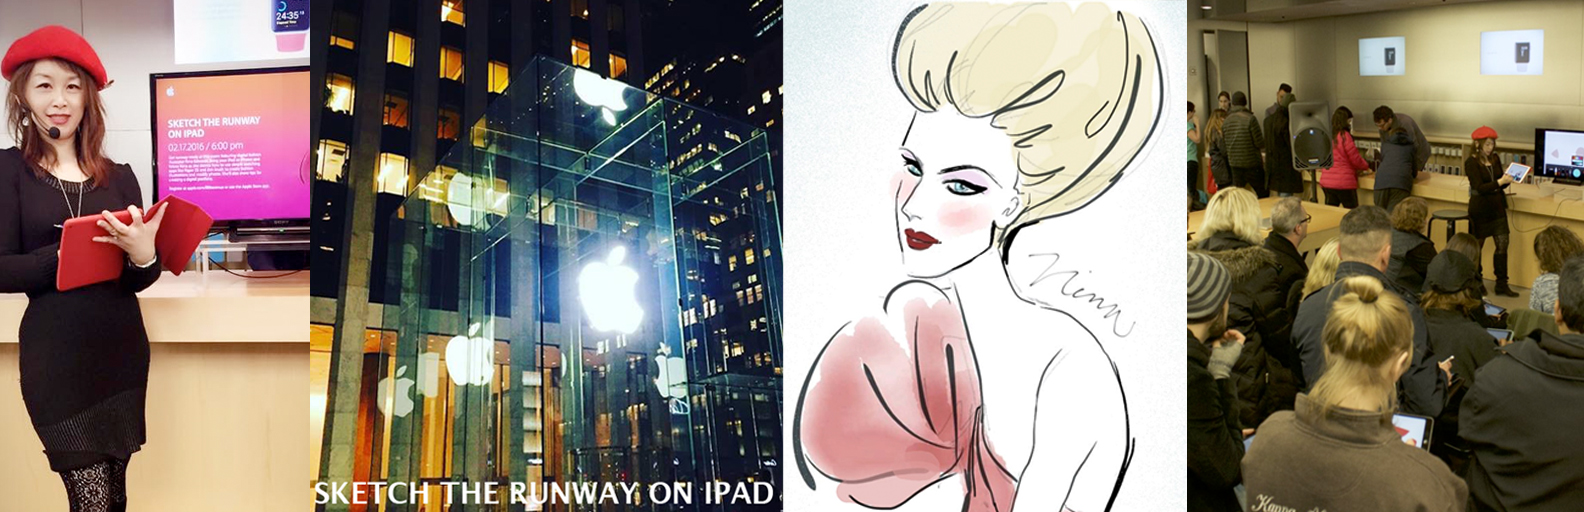 About Applestore.jpg